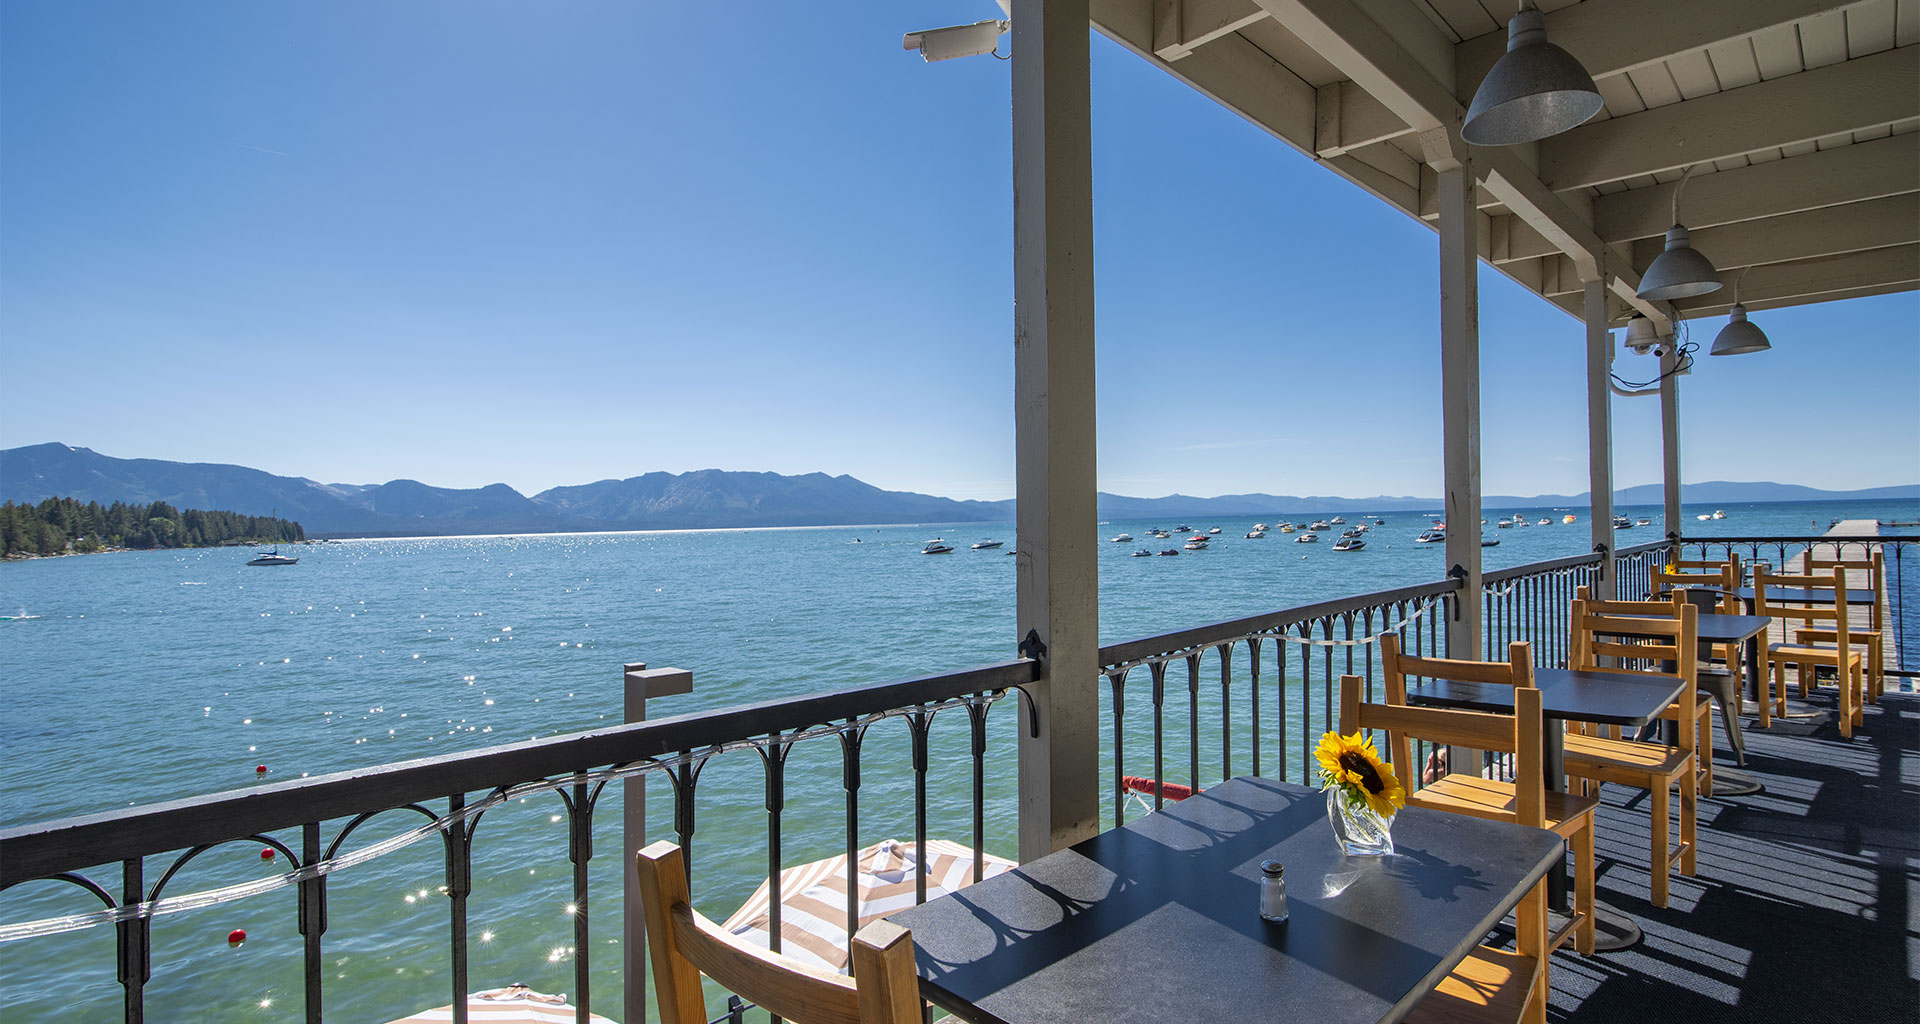 Beach Retreat and Lodge Boat House Balcony Seating